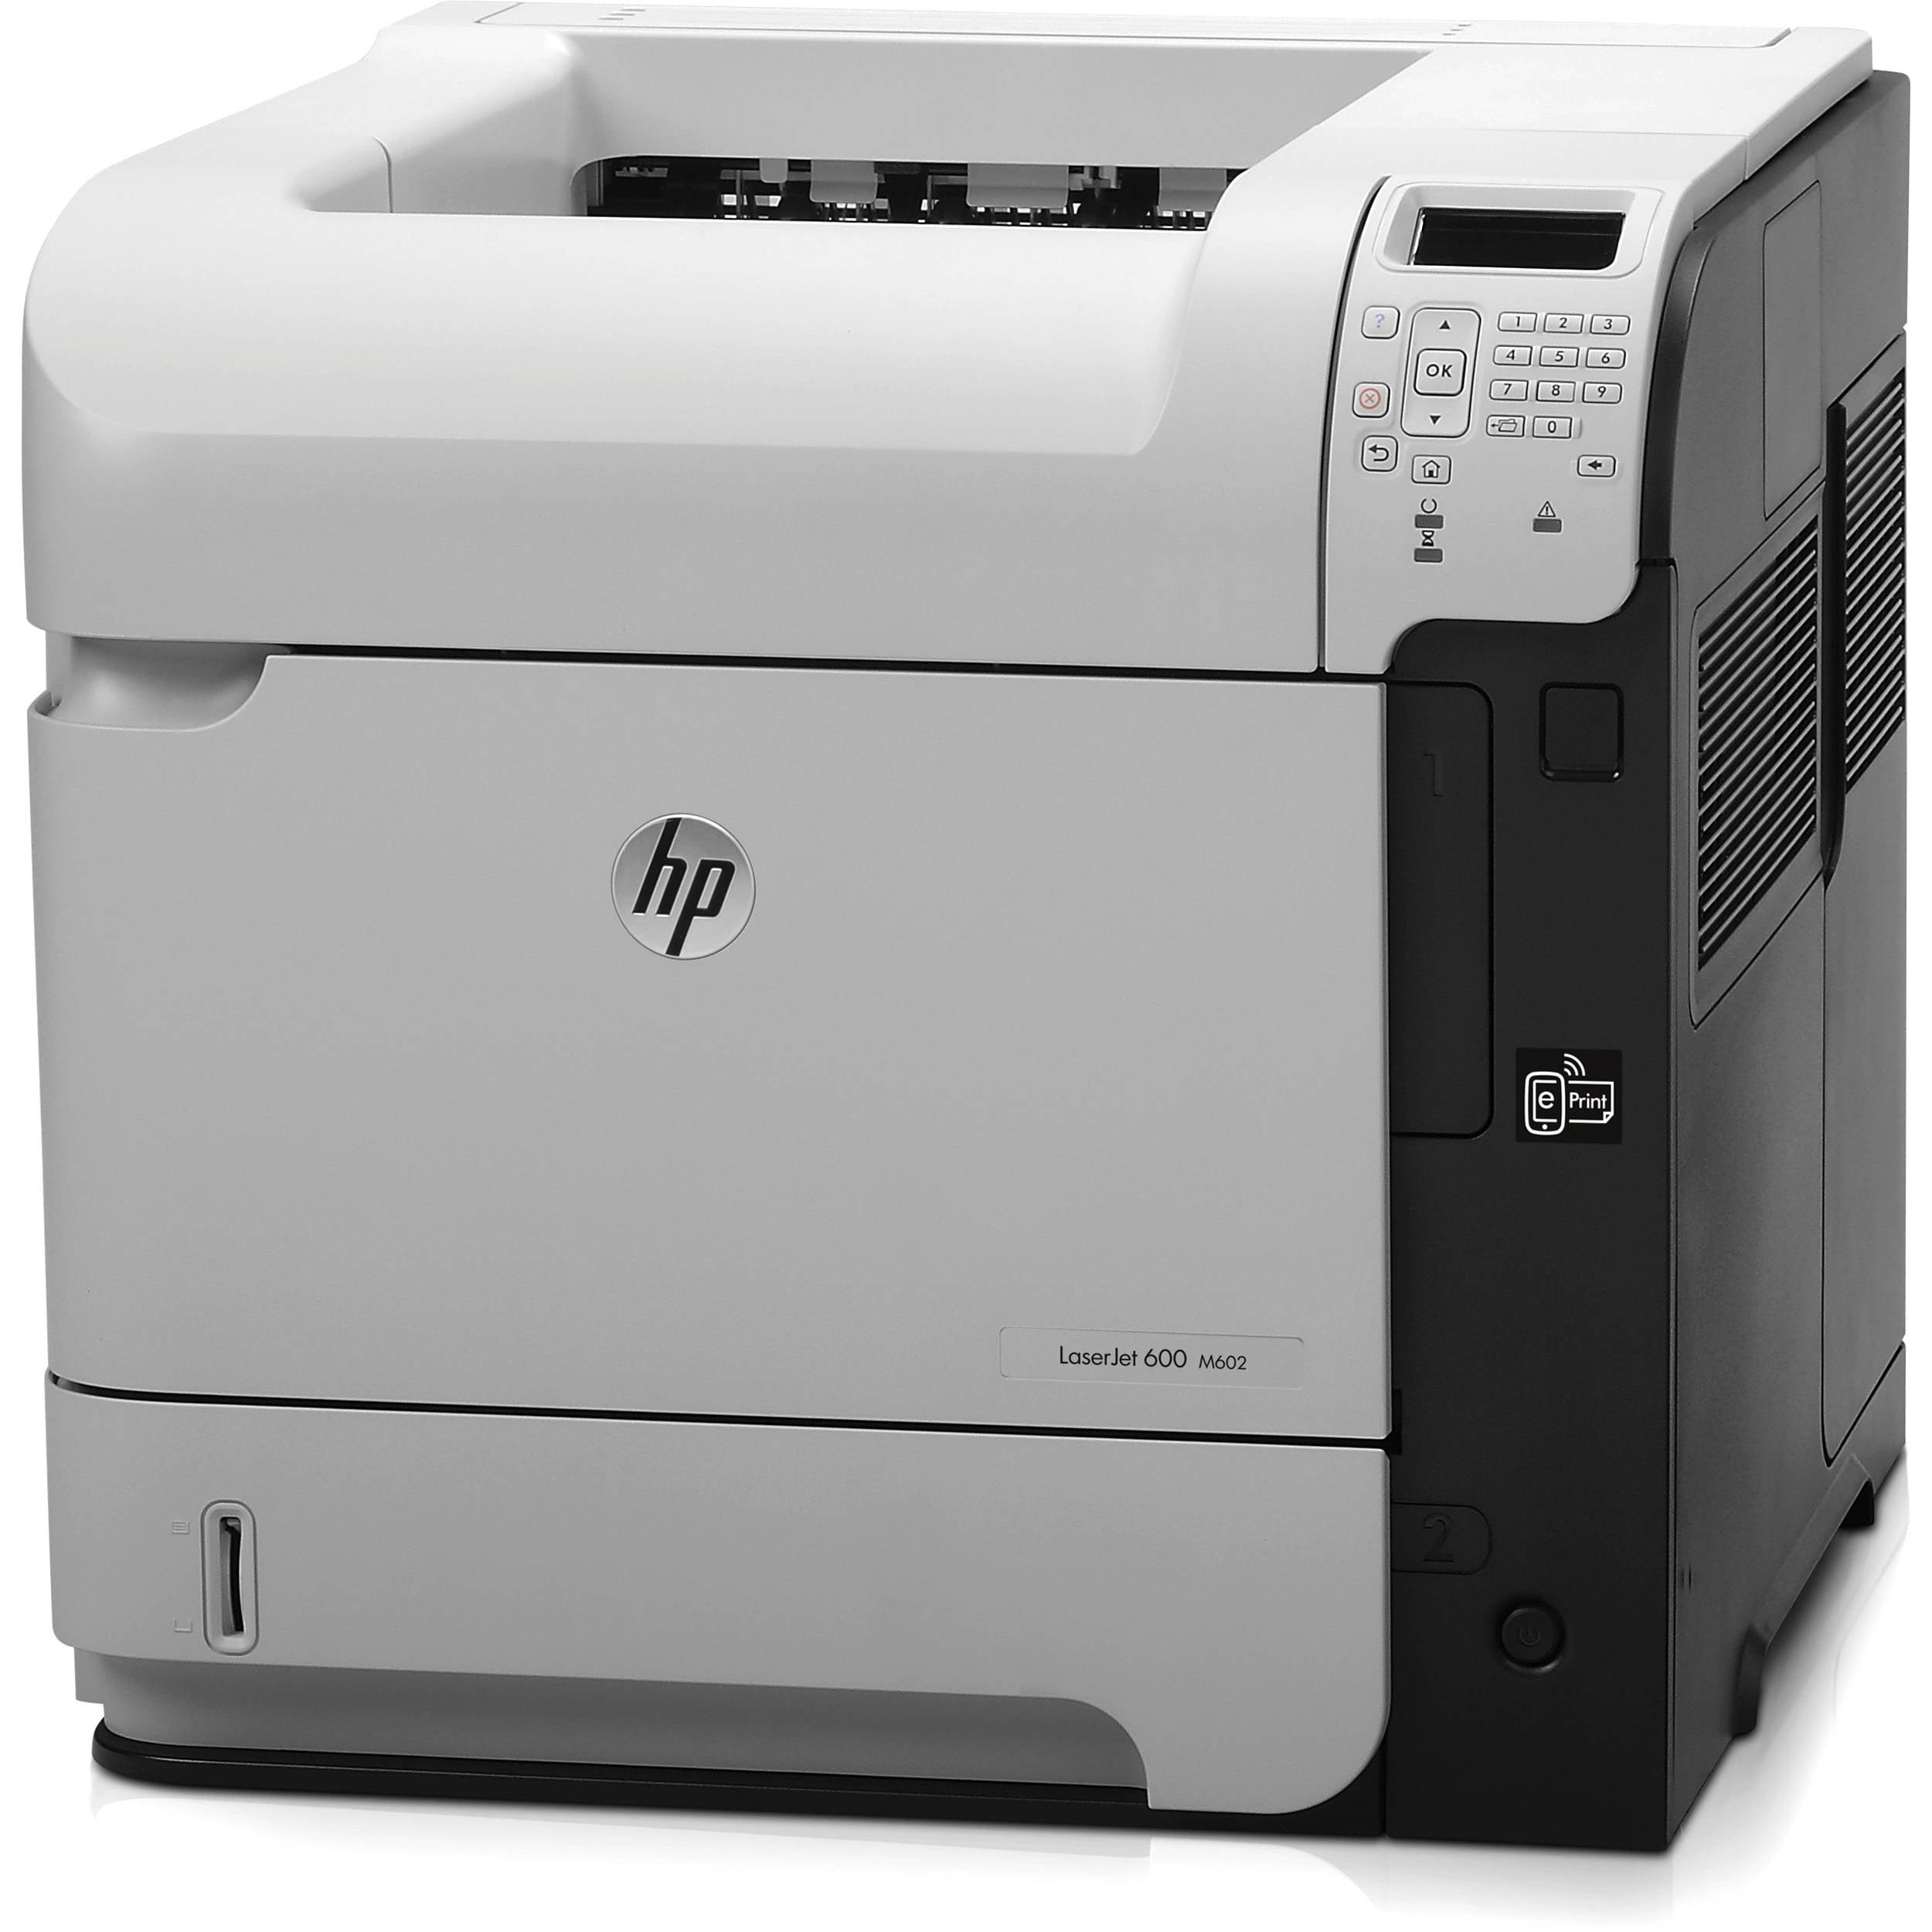 Refurbished HP 600 M602 LaserJet Enterprise Printer Network Workgroup CE991A